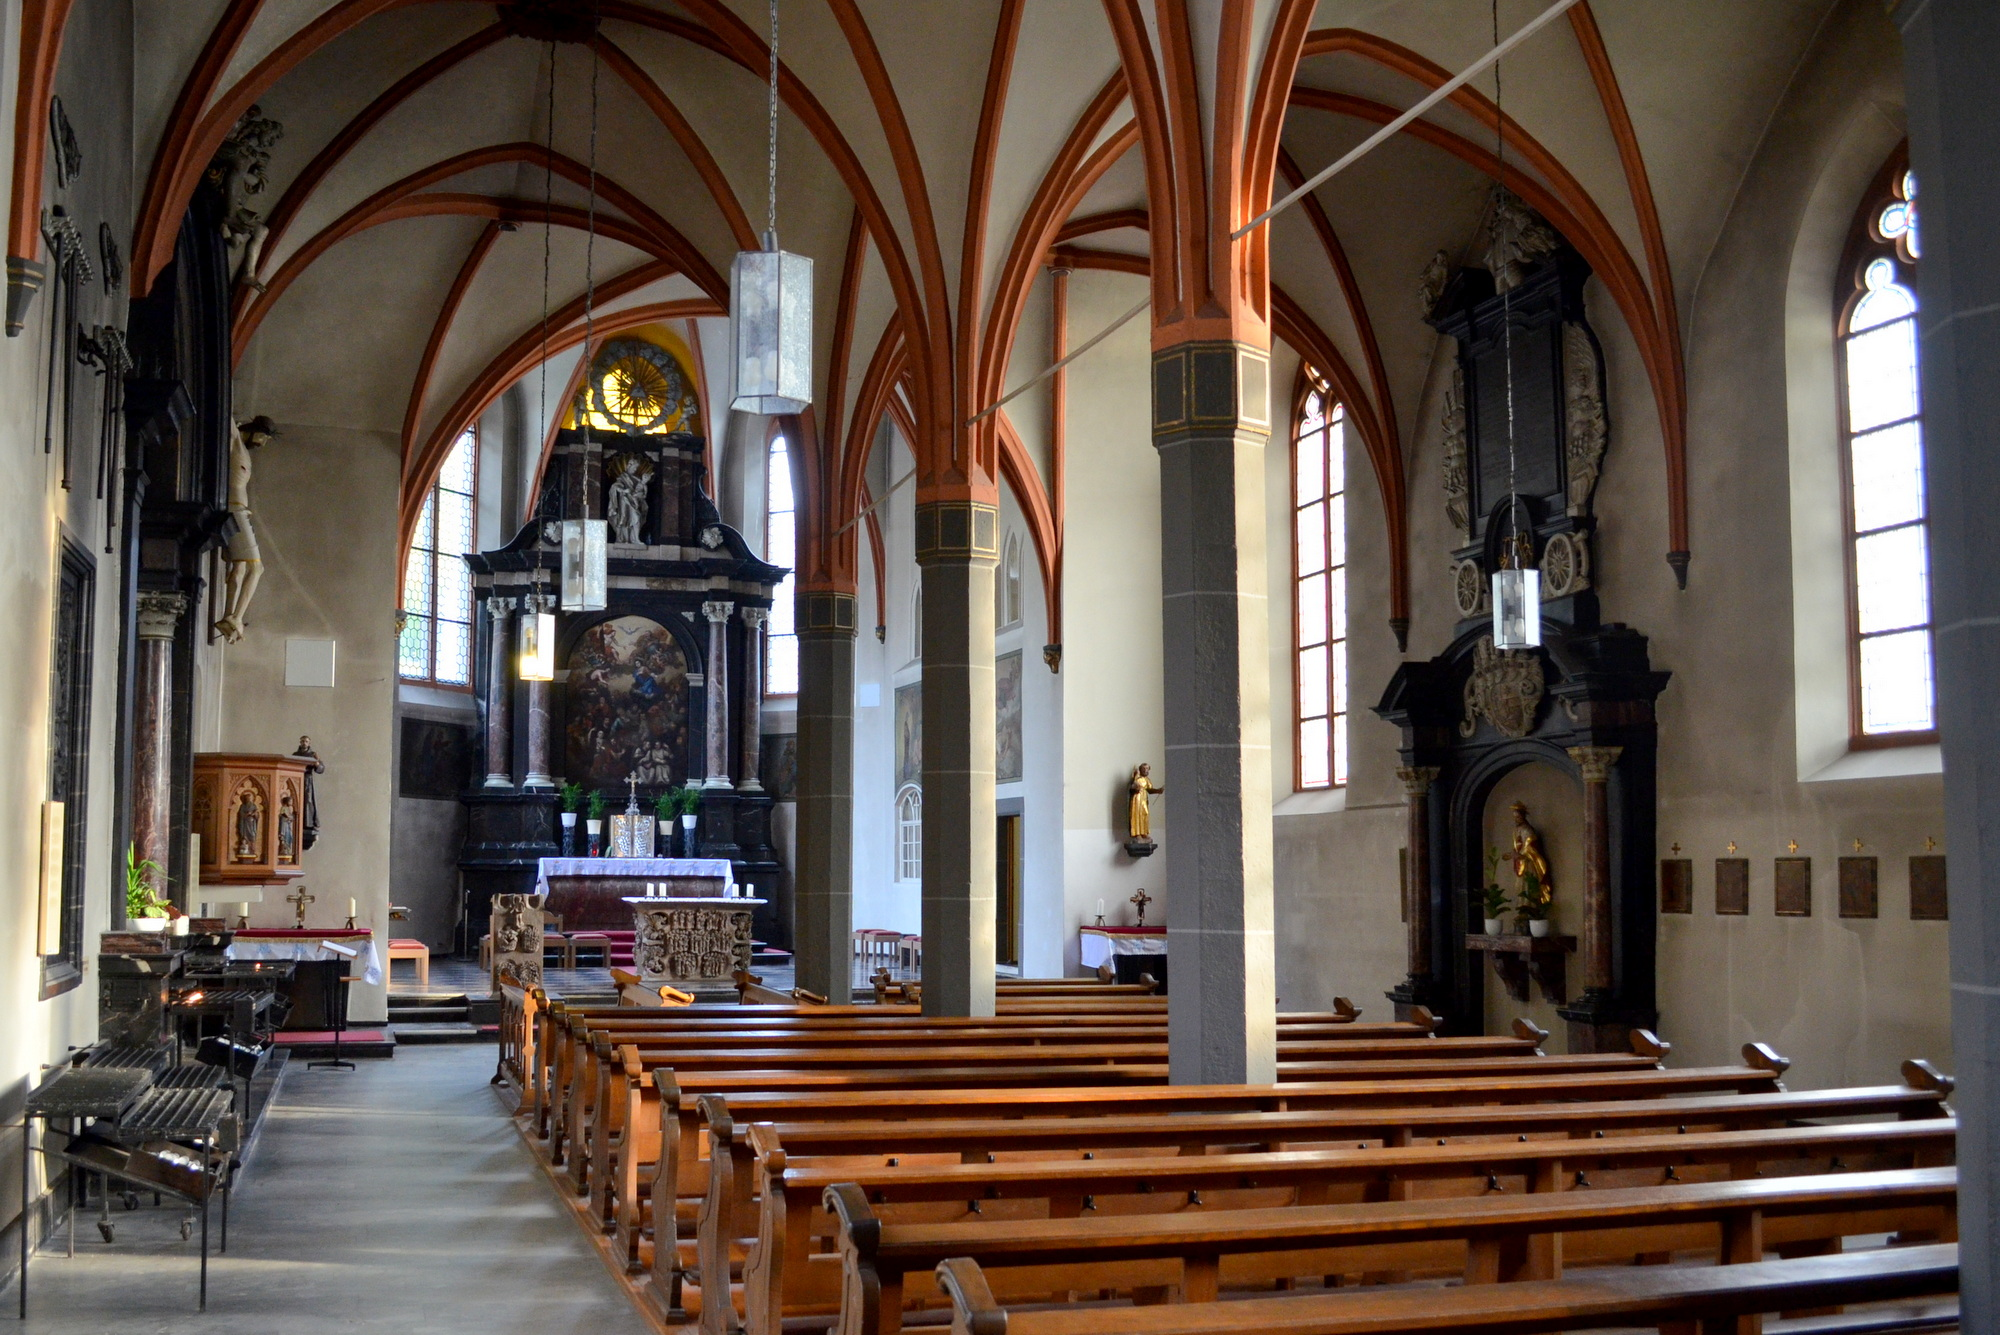 File:Kamp-Bornhofen, interieur Mariakerk.jpg - Wikimedia Commons